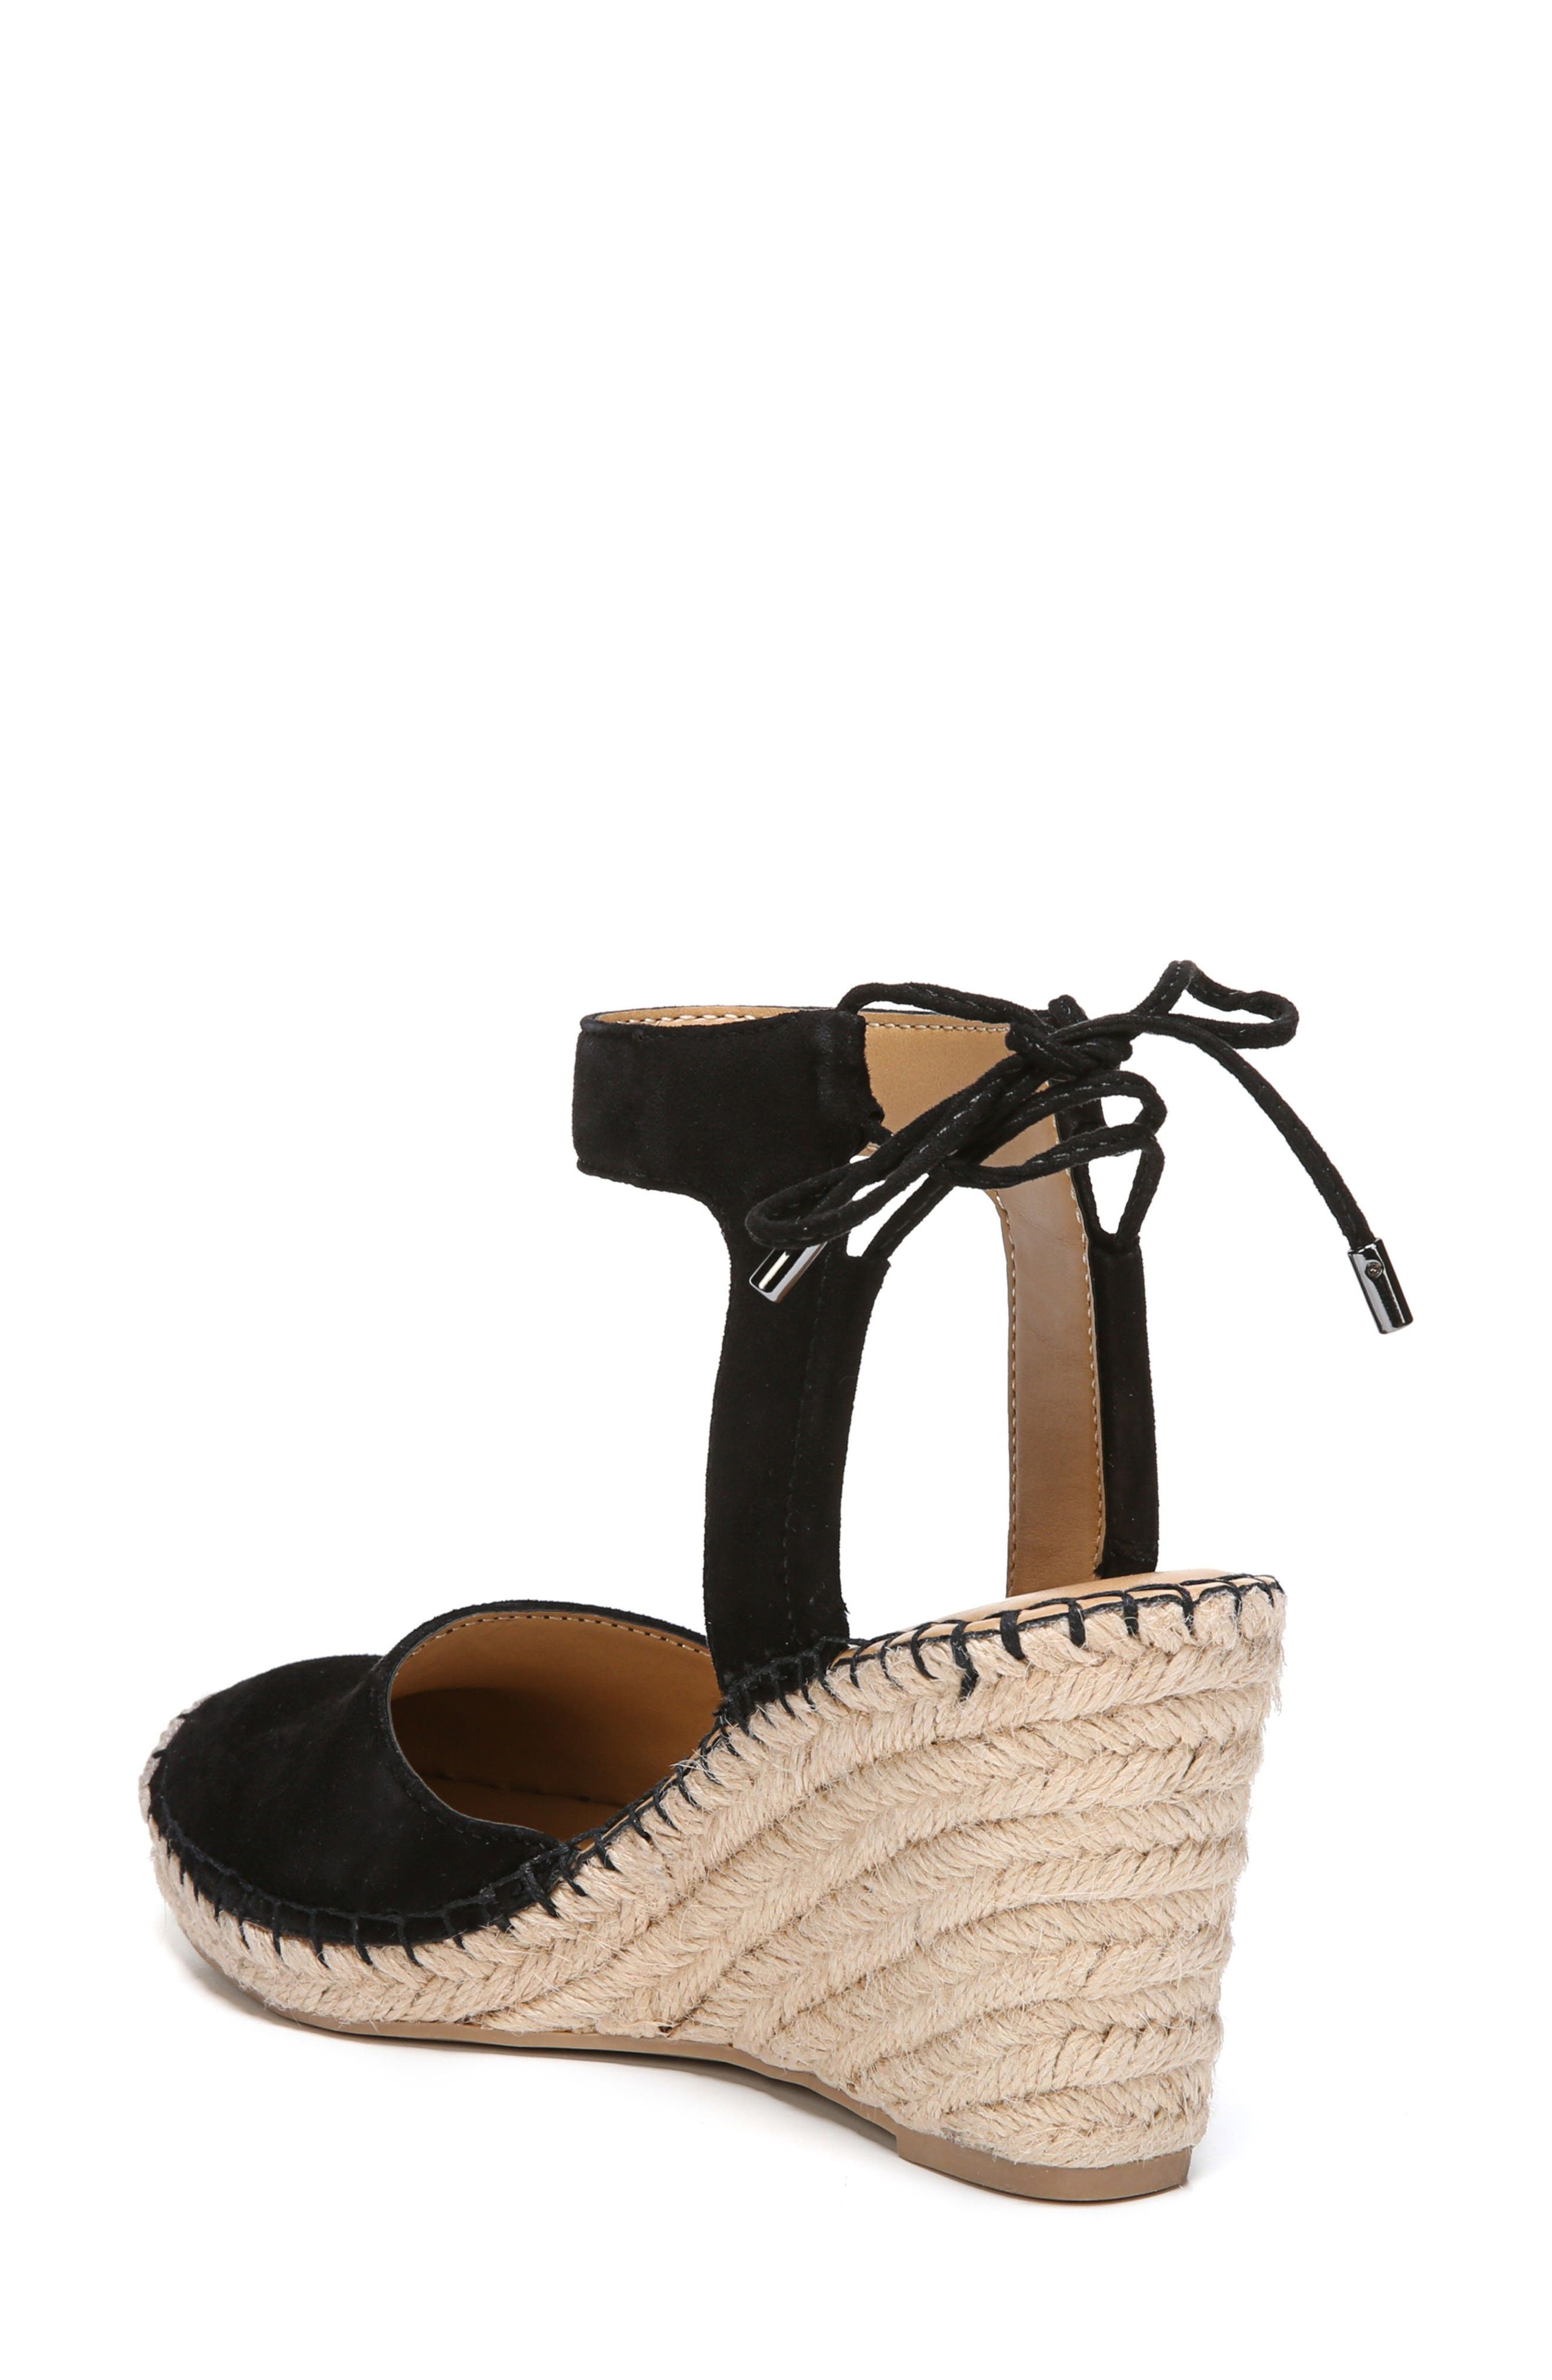 Mariska Espadrille Wedge Sandal,                             Alternate thumbnail 2, color,                             002